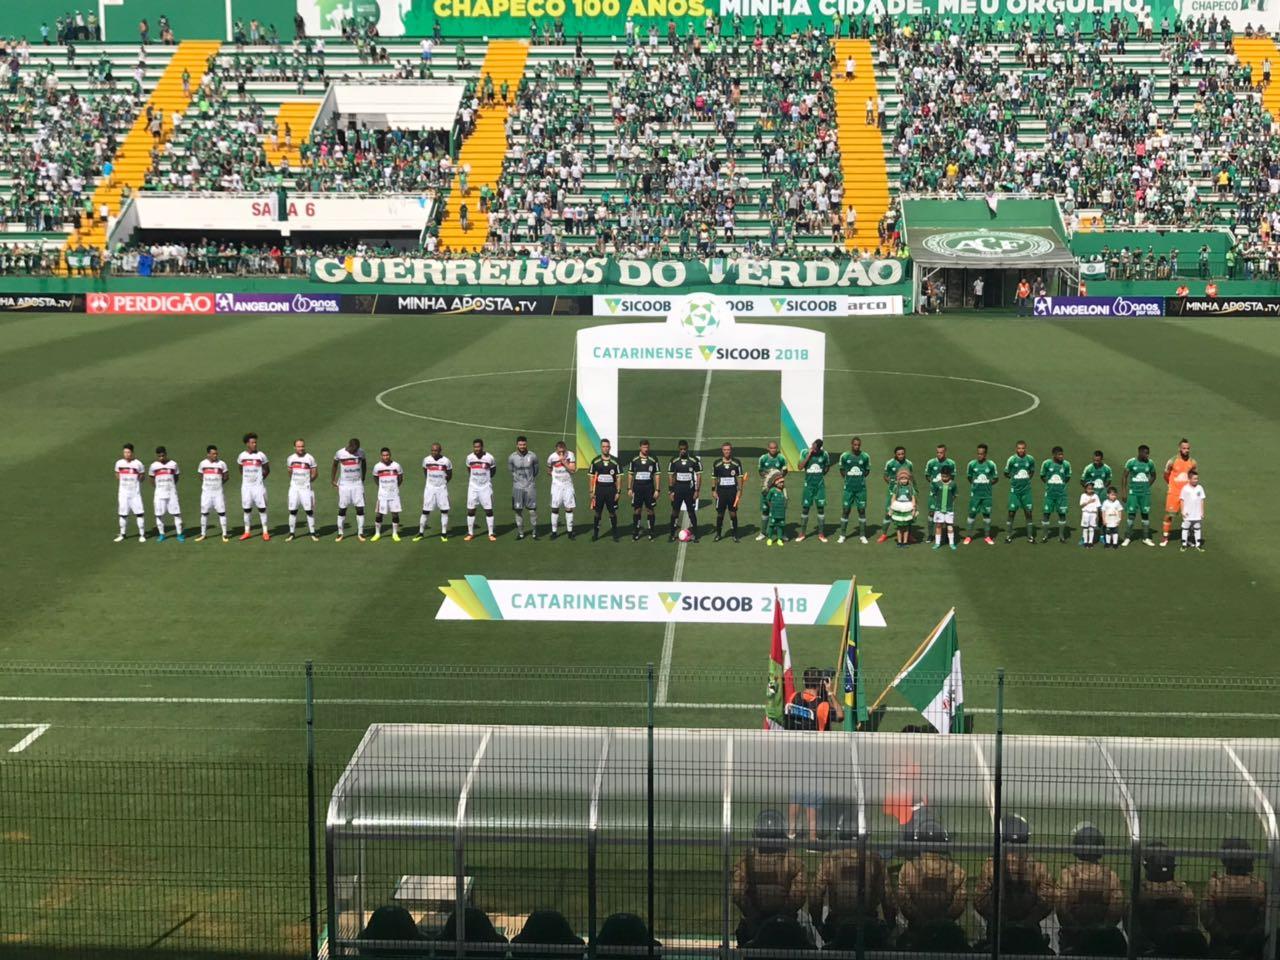 Chape vence o Joinville e assume a liderança do Catarinense